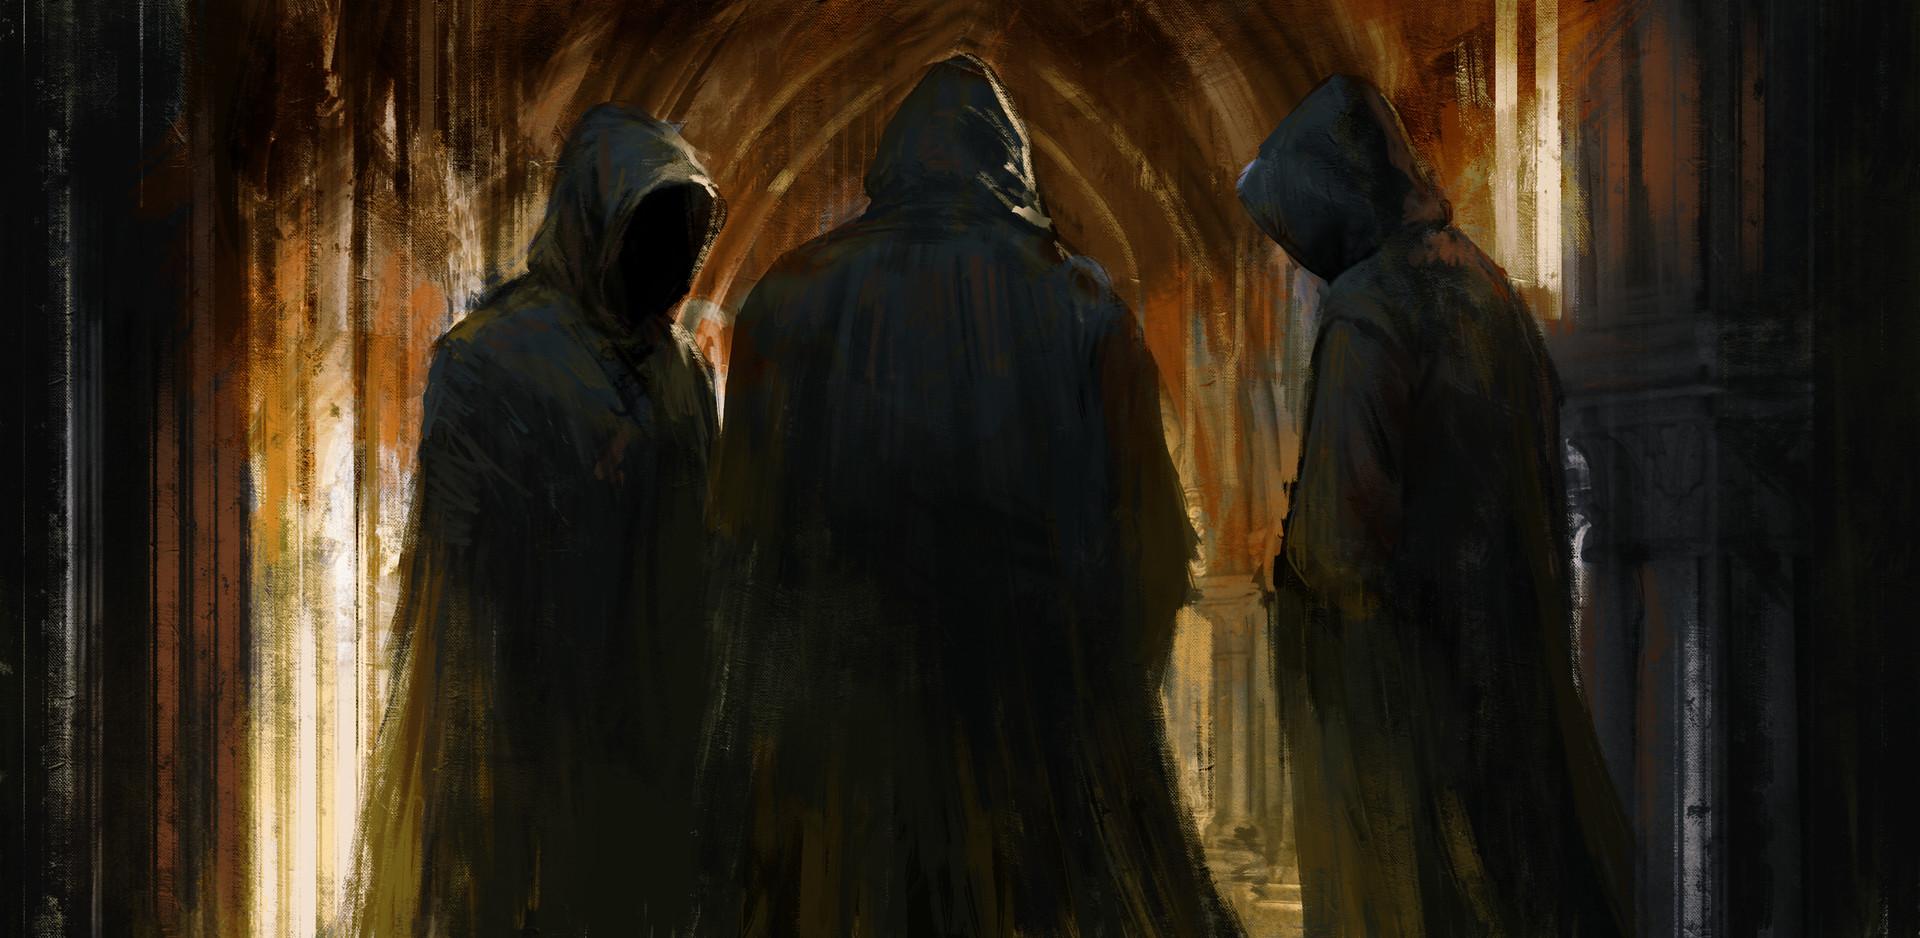 Imad ud din assassins